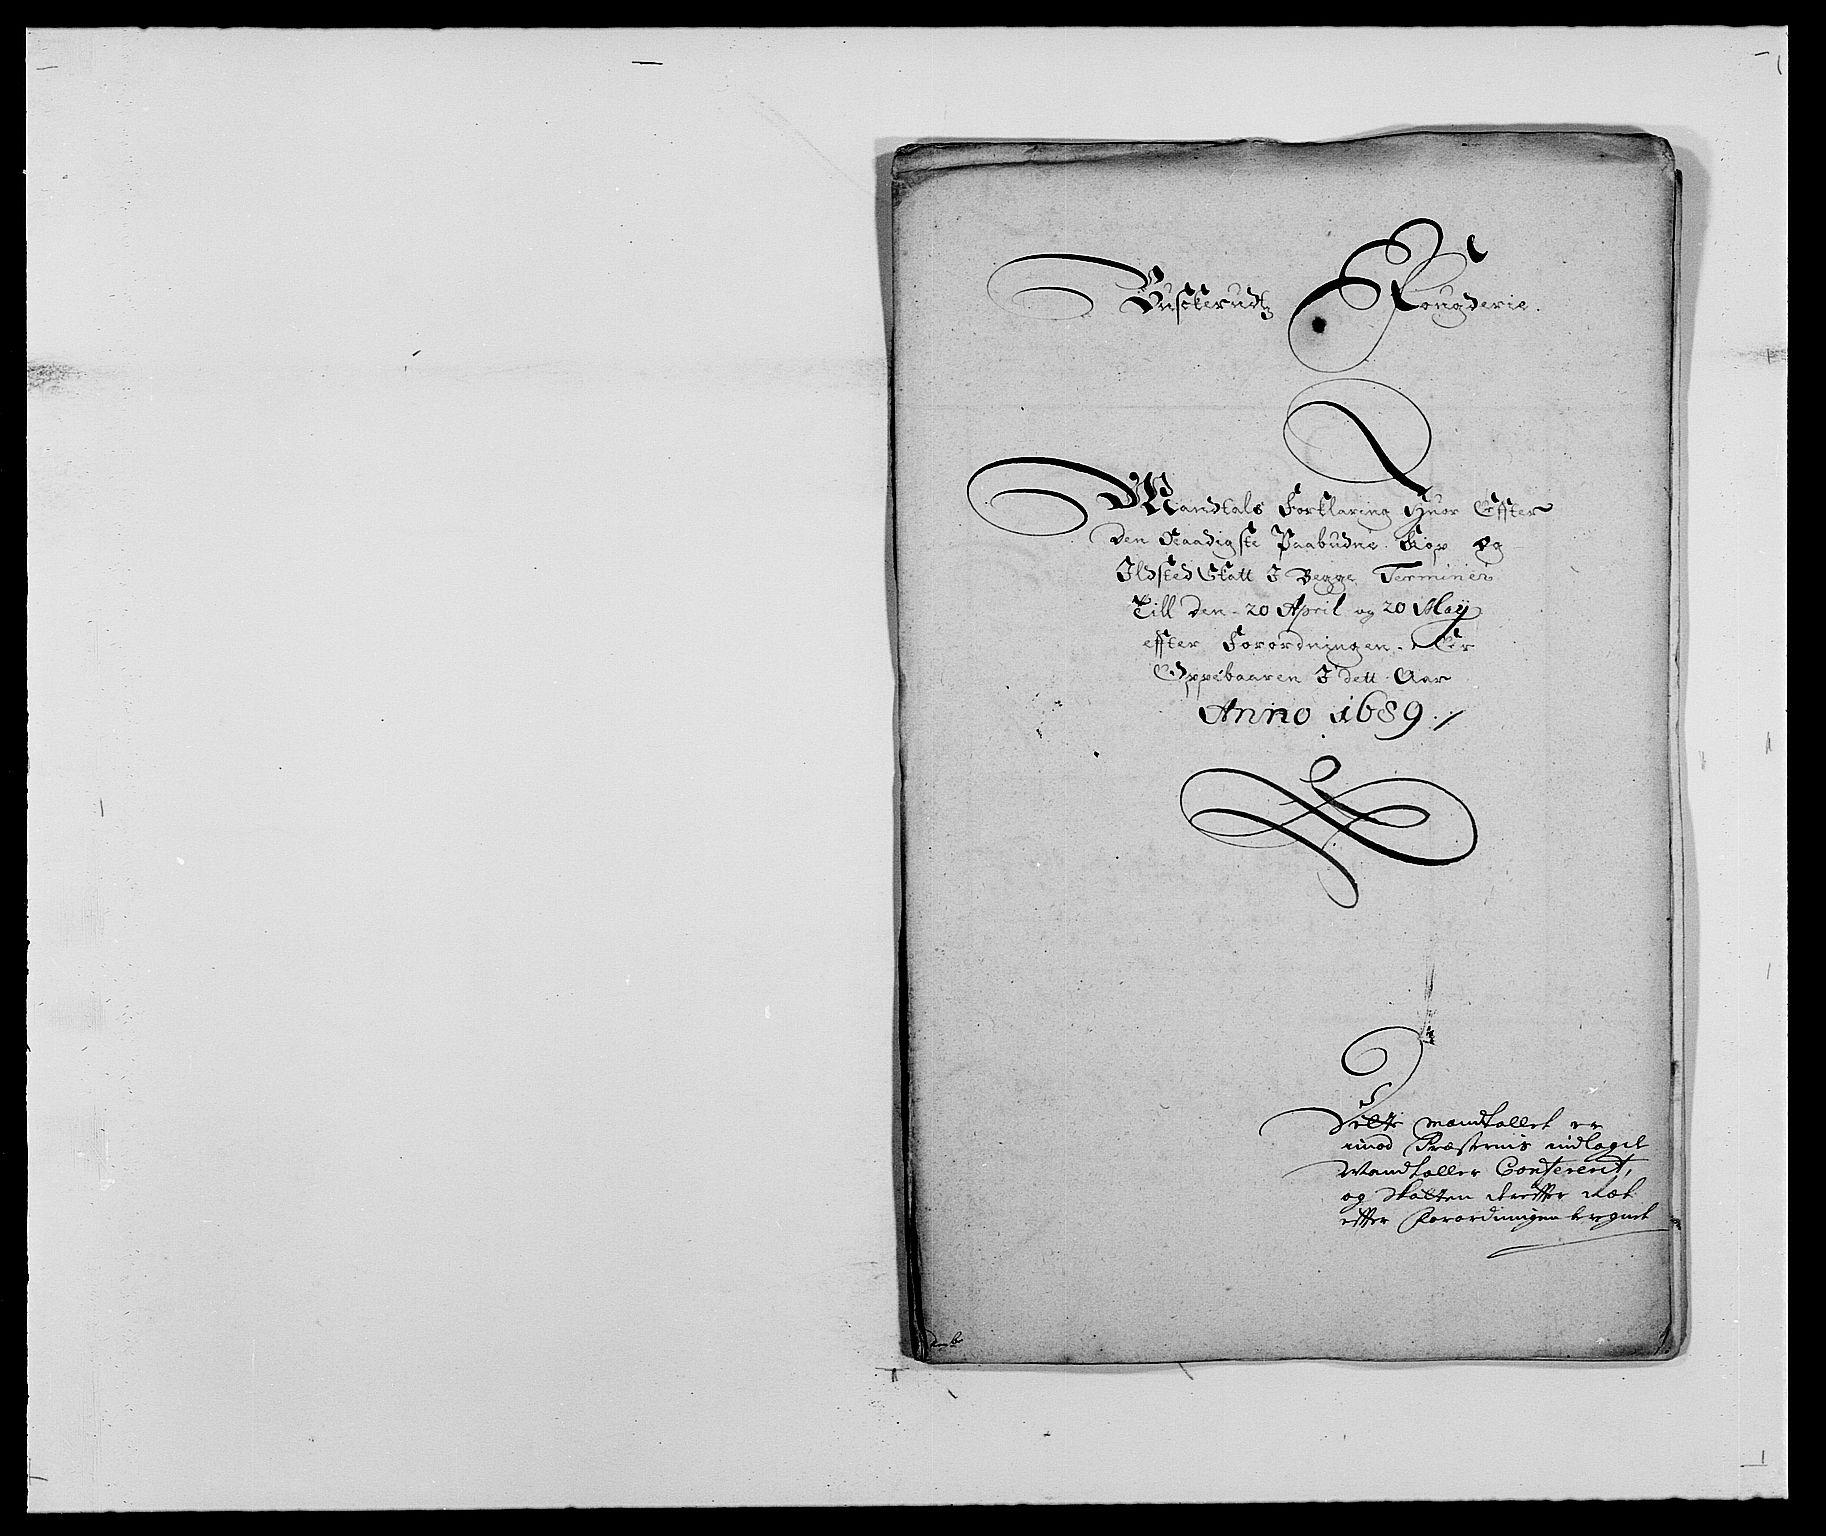 RA, Rentekammeret inntil 1814, Reviderte regnskaper, Fogderegnskap, R25/L1680: Fogderegnskap Buskerud, 1689-1690, s. 228